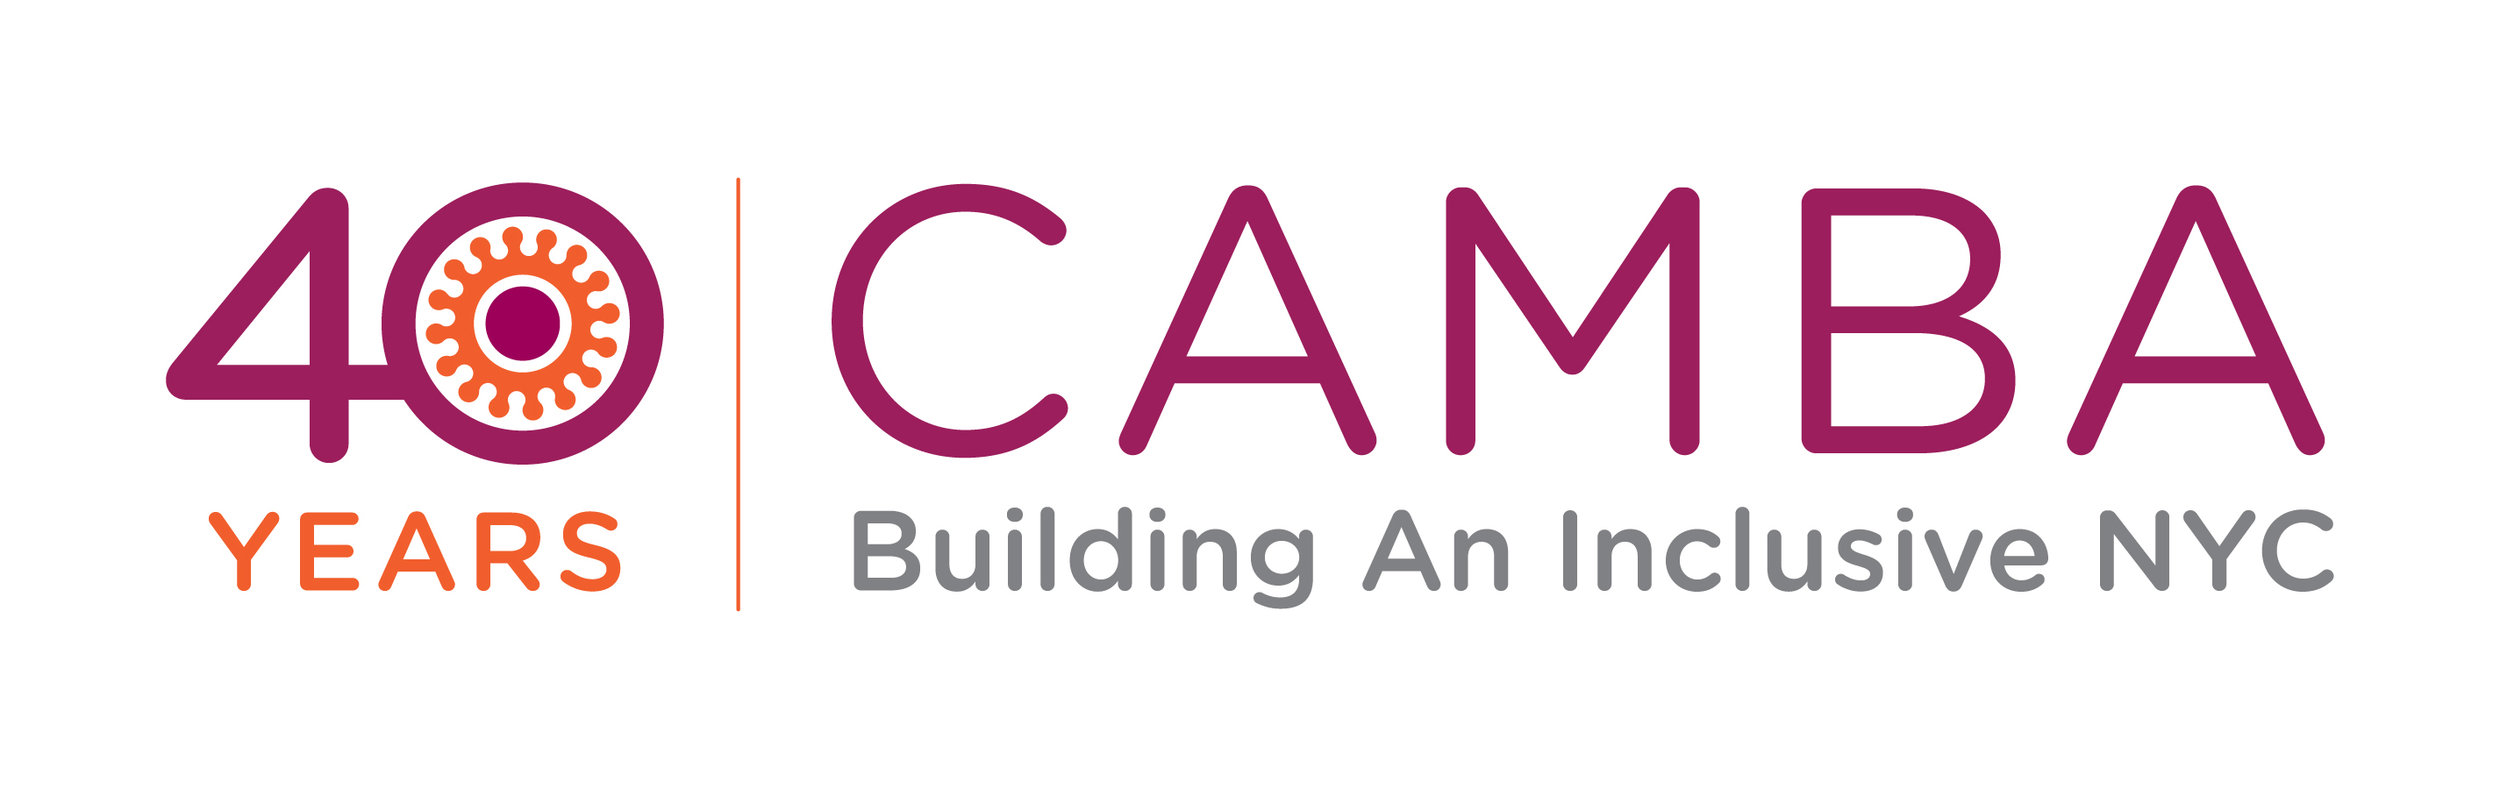 CAMBA_40_Horizontal_RGB.jpg